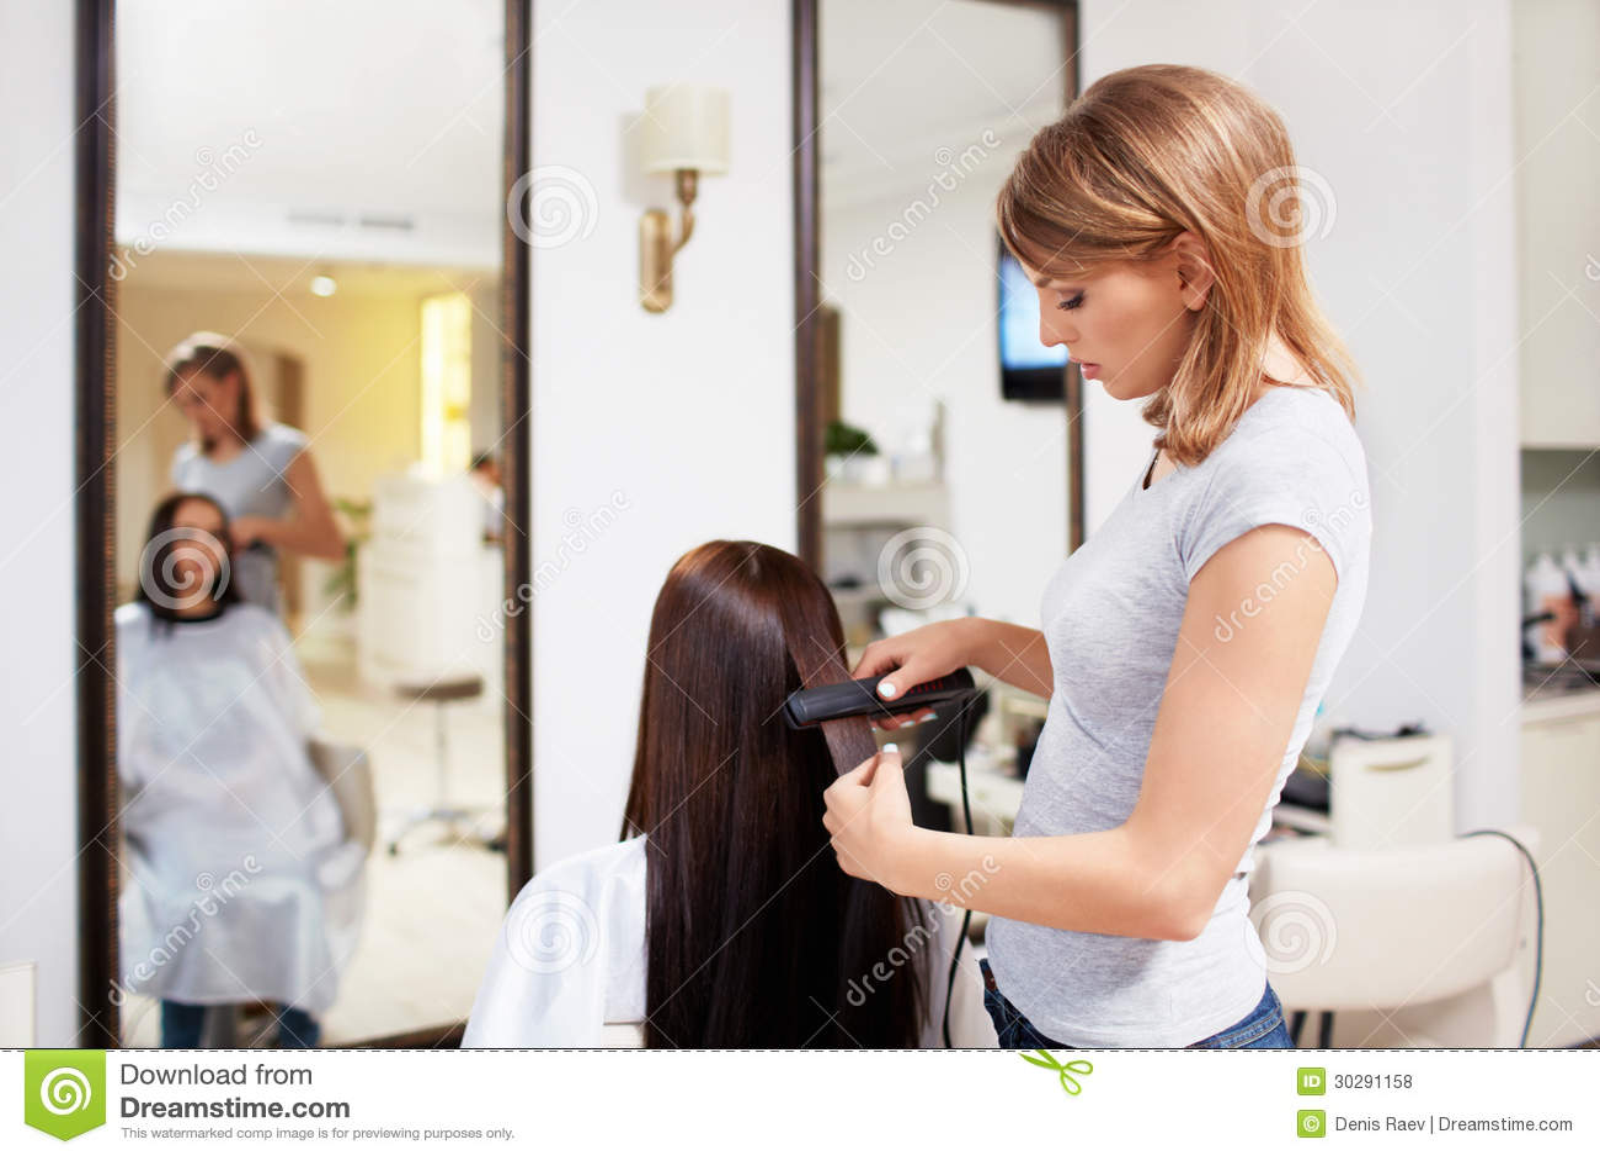 Barbershop Royalty Free Stock Photos - Image: 30291158